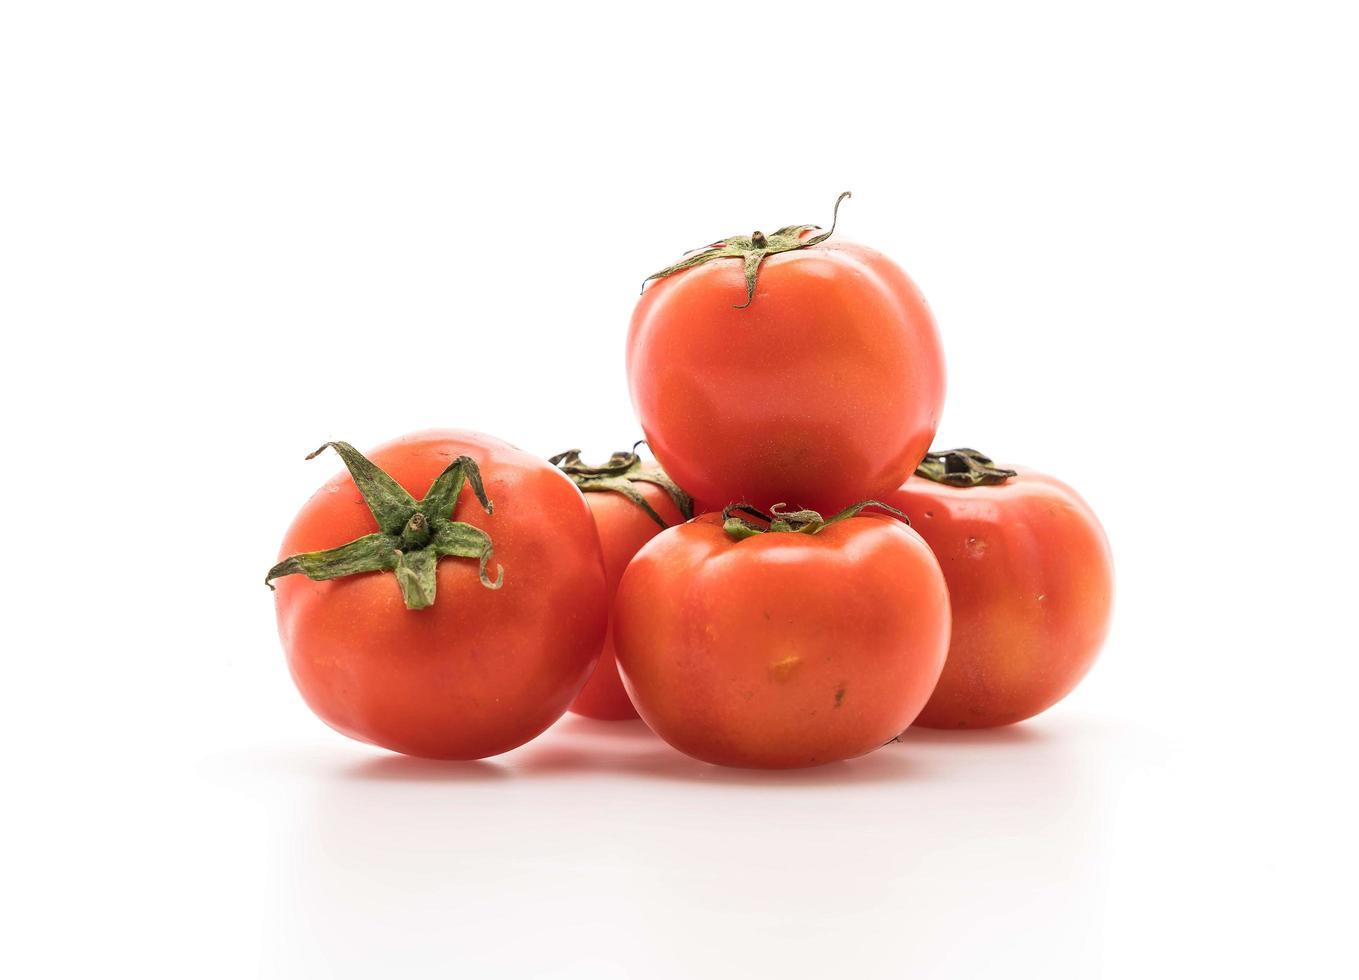 verse tomaten op witte achtergrond foto